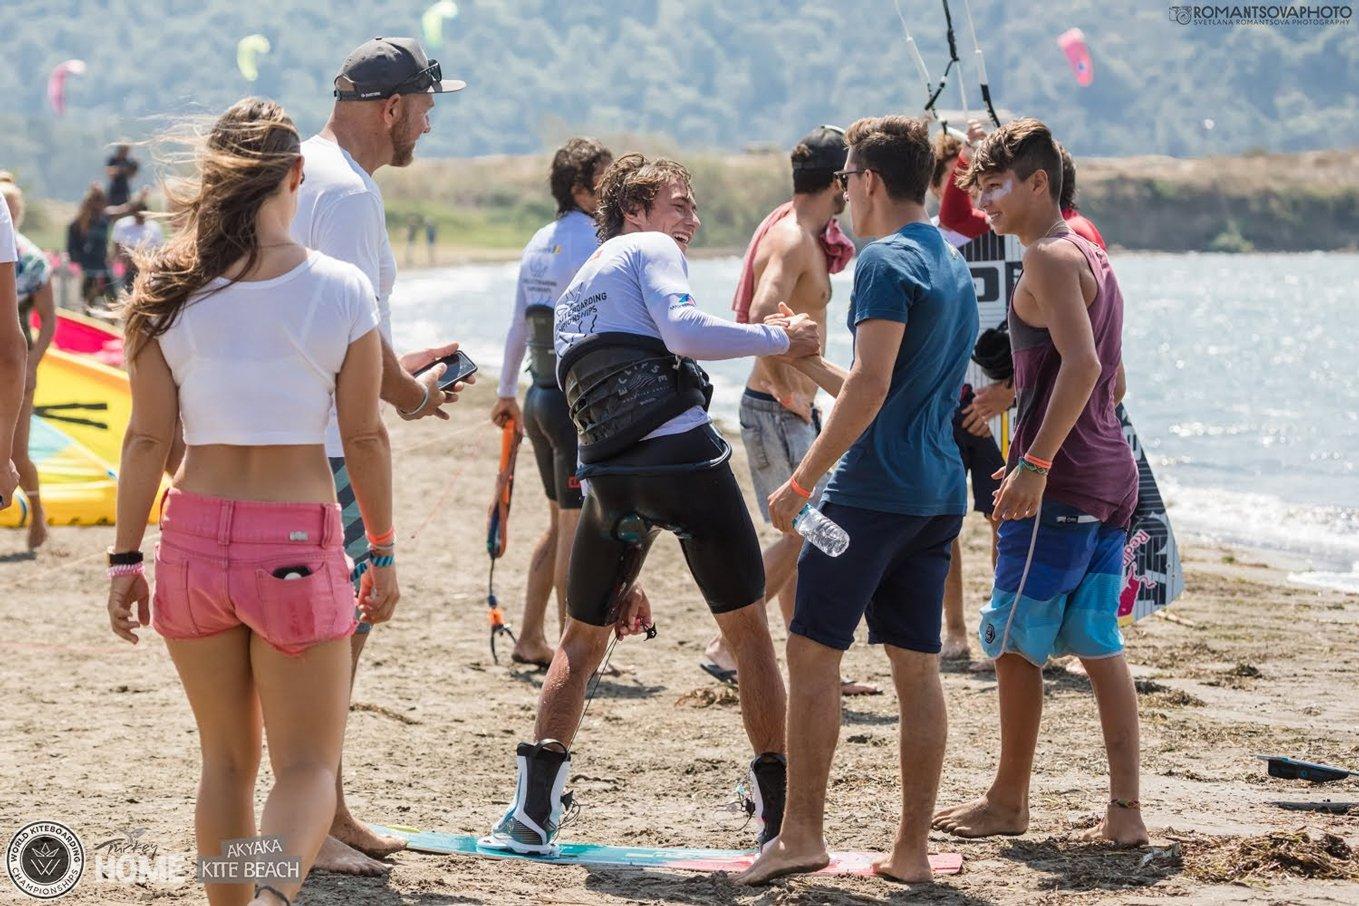 competition kitesurf-Chabloz avec amis